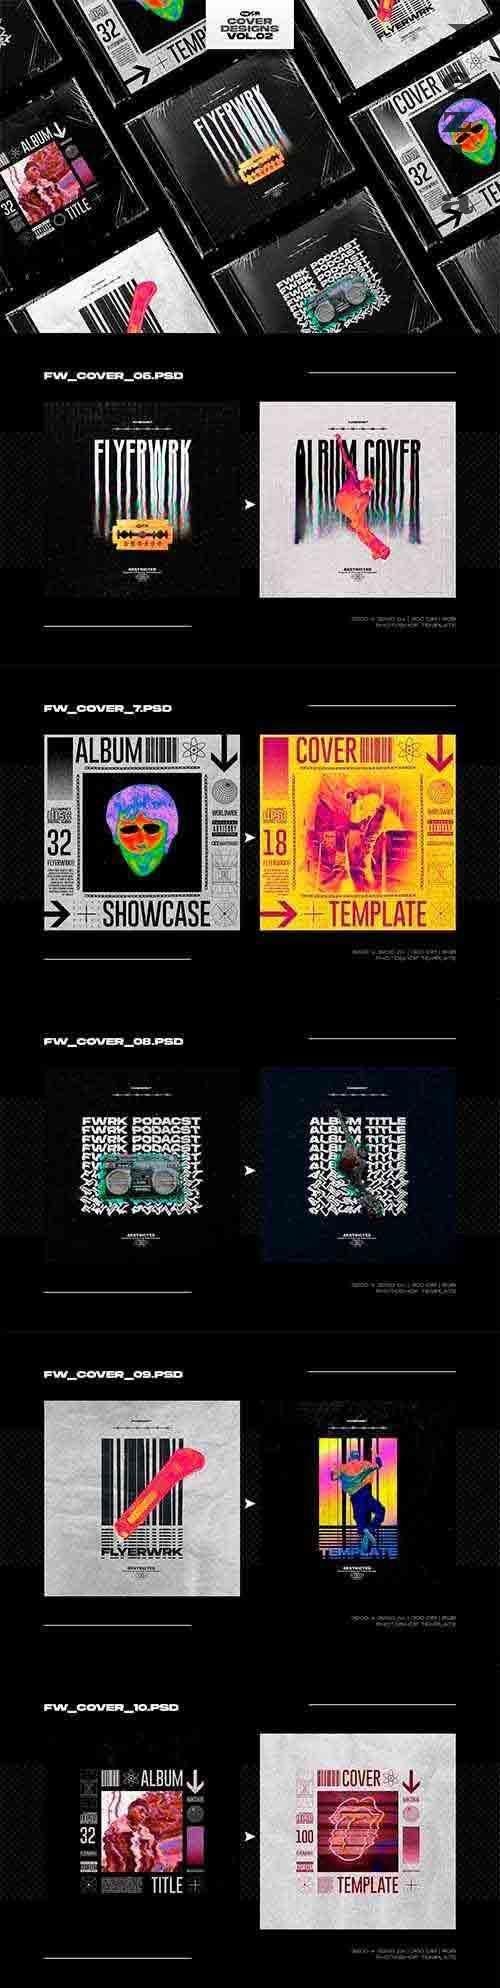 CreativeMarket - Cover Design Templates Vol.2 5680118